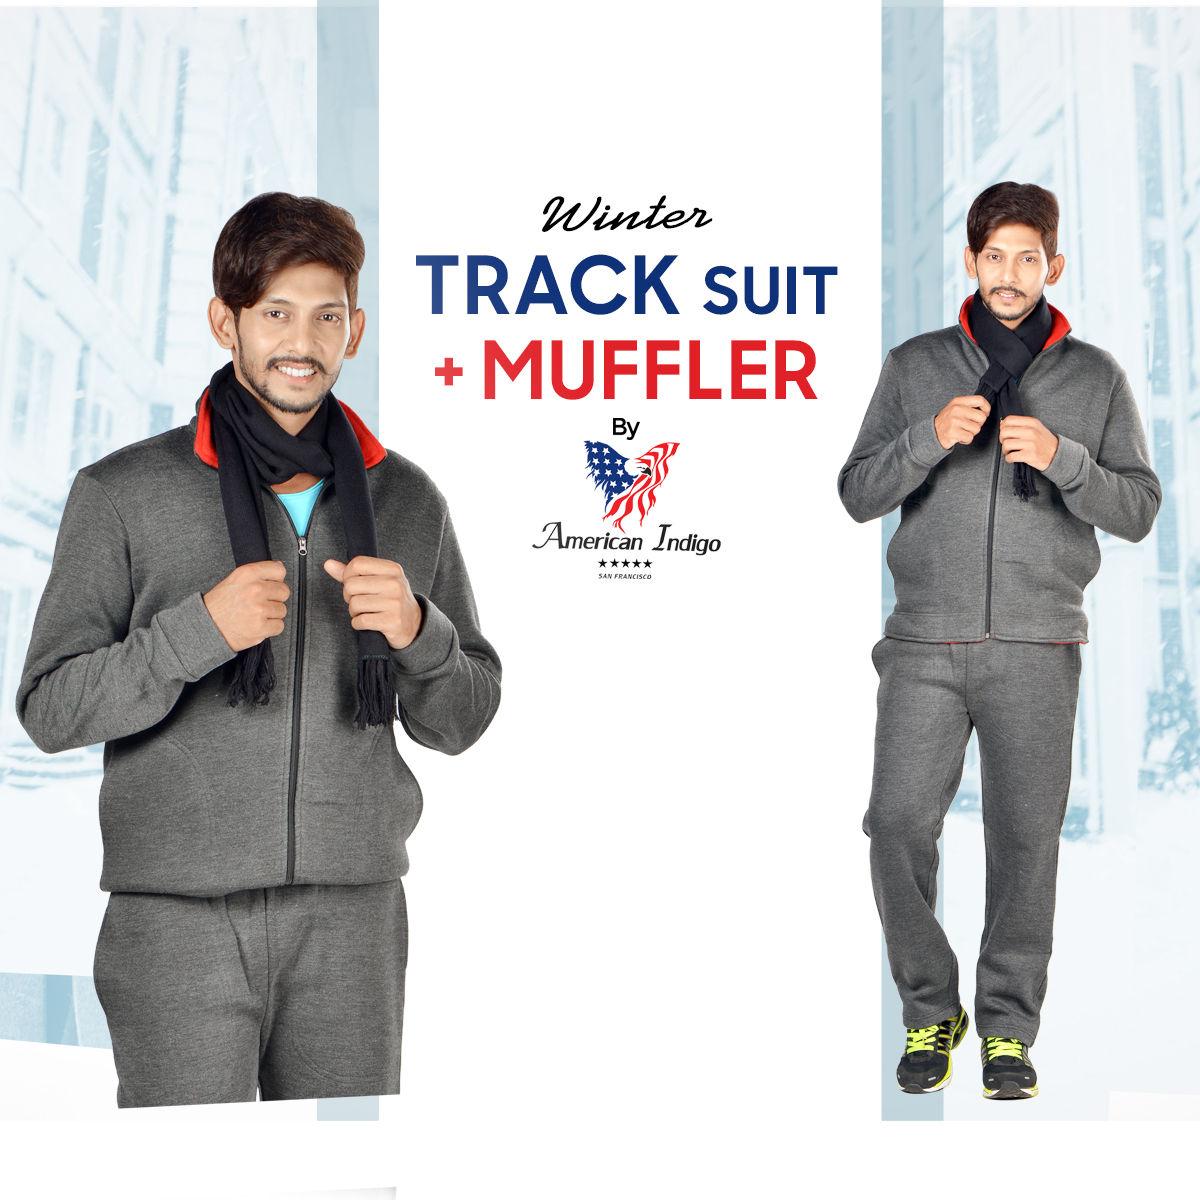 d79cd8656 Buy American Indigo Winter Track Suit + Muffler Online at Best Price in  India on Naaptol.com